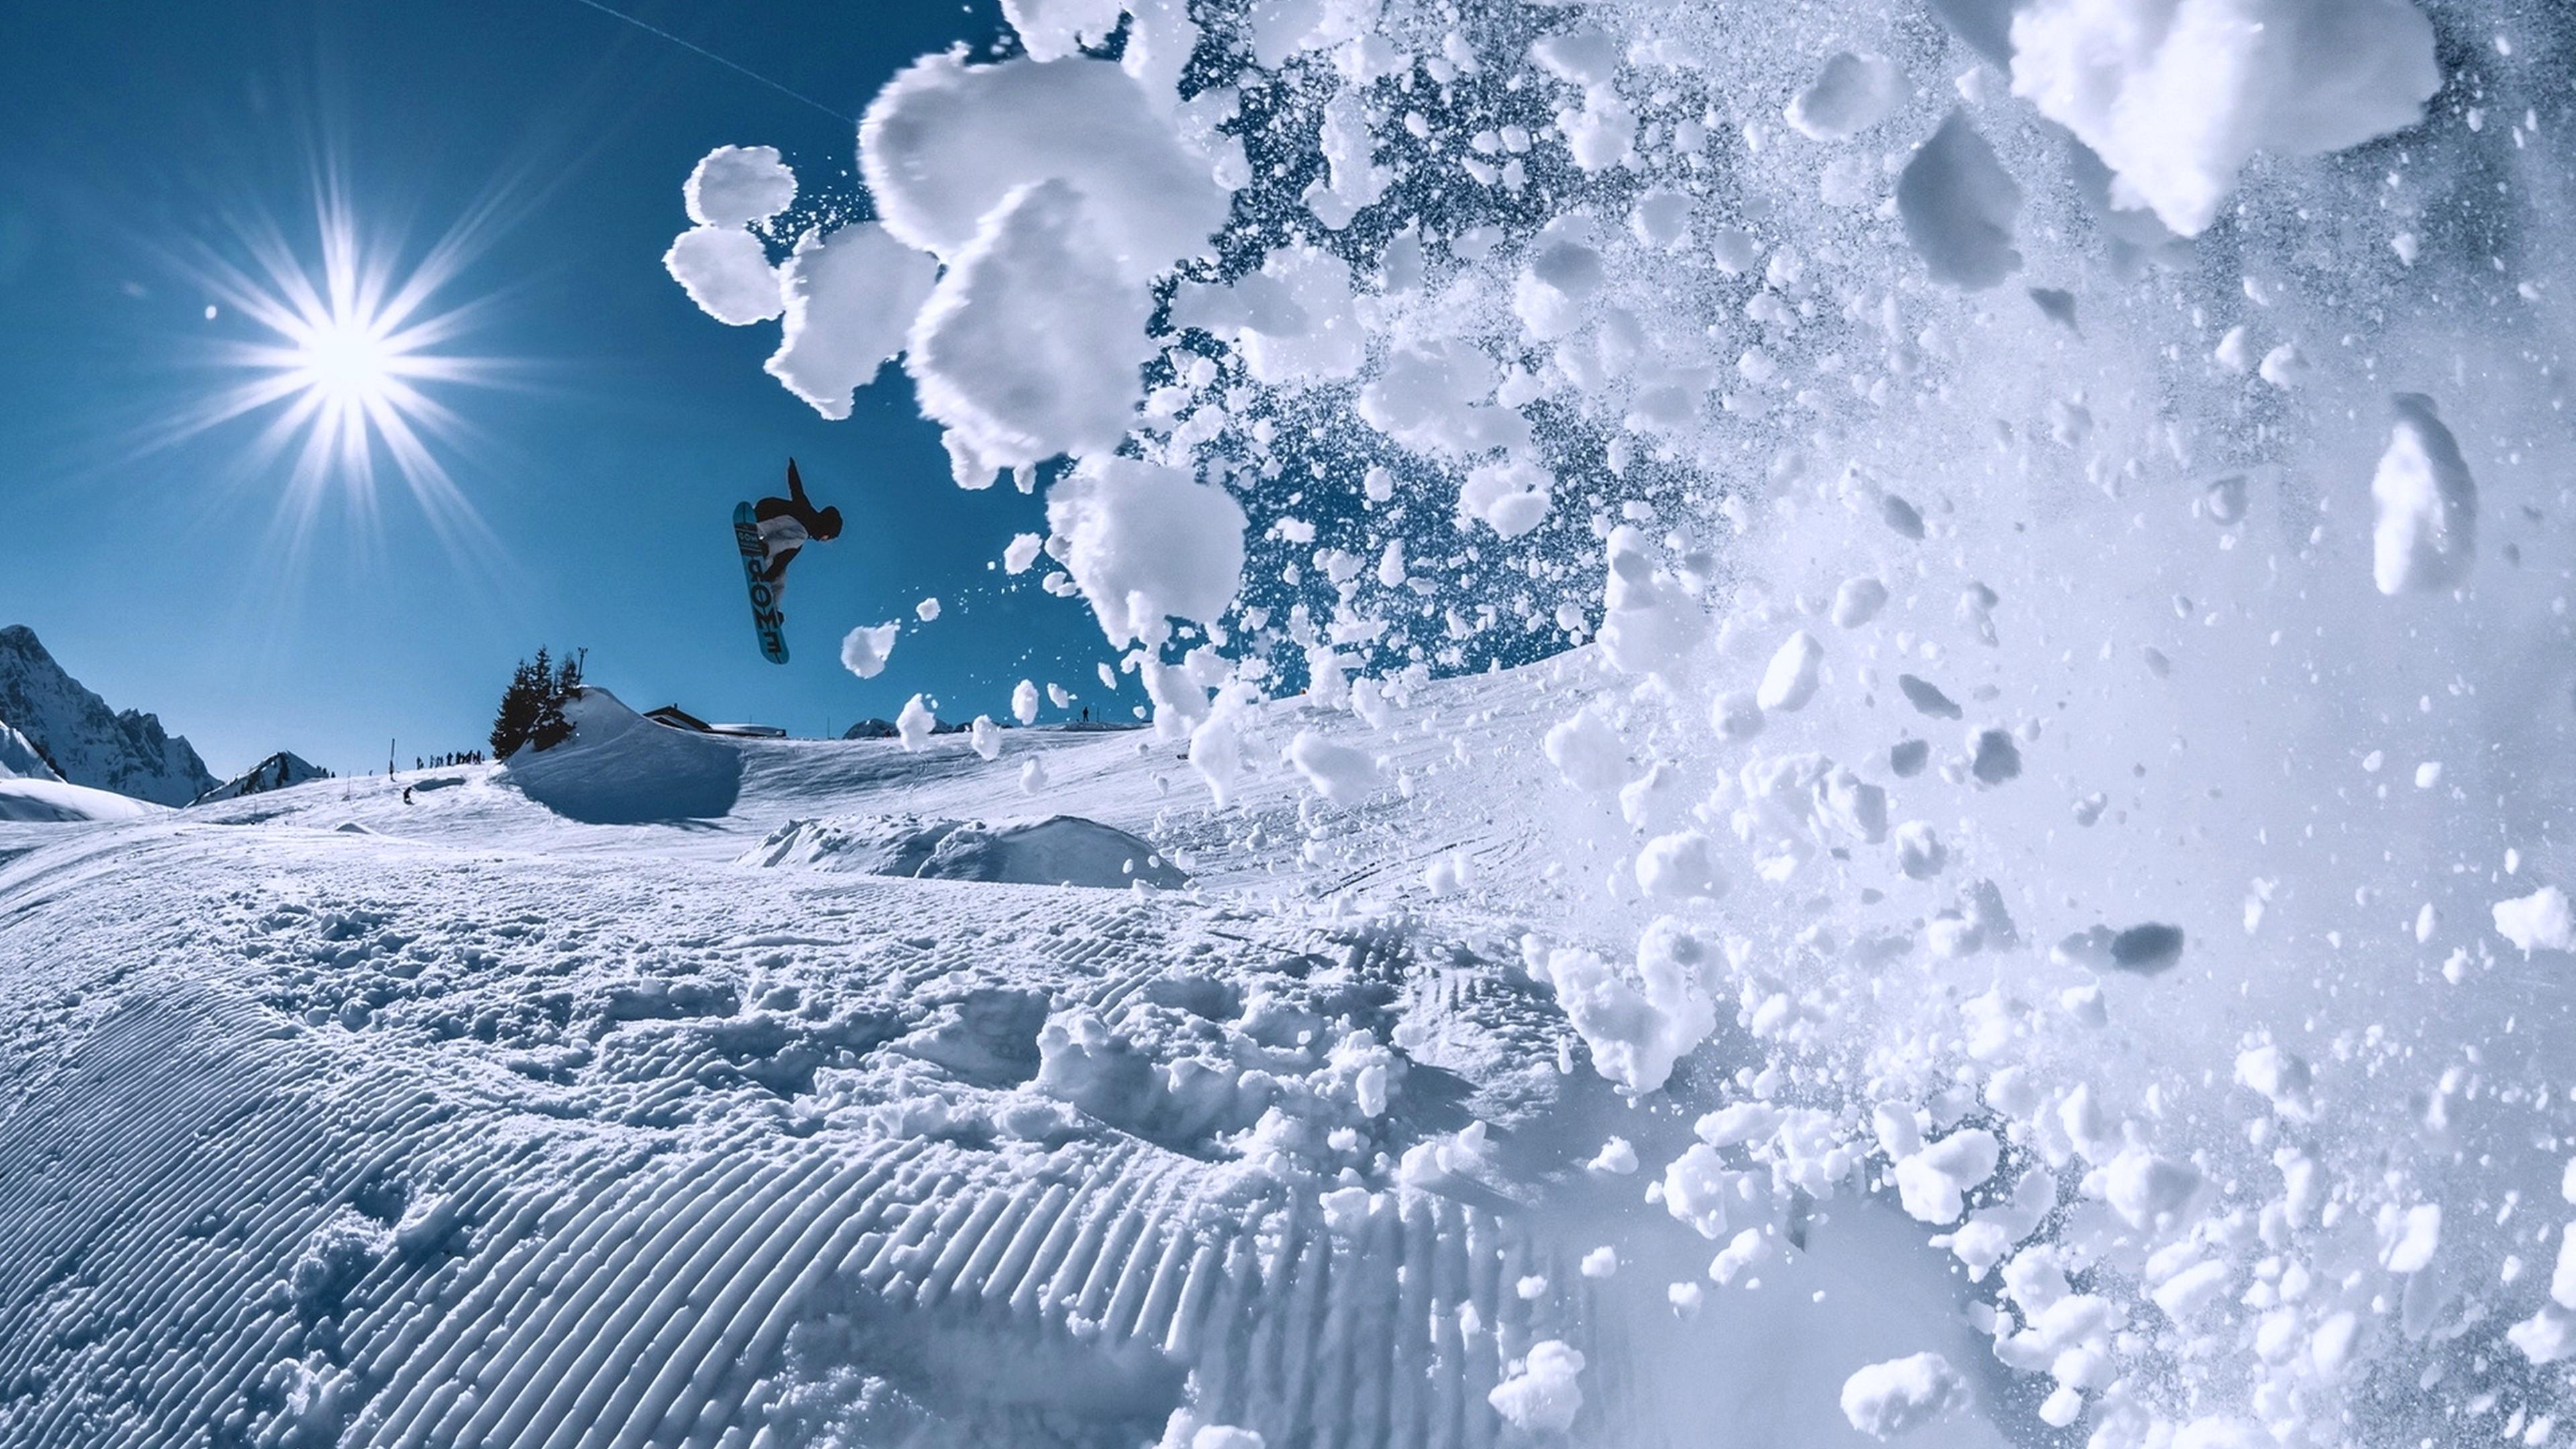 3840x2160 Wallpaper Cars Wallpaper Snowboarding Winter Snow 4k Sport 17399